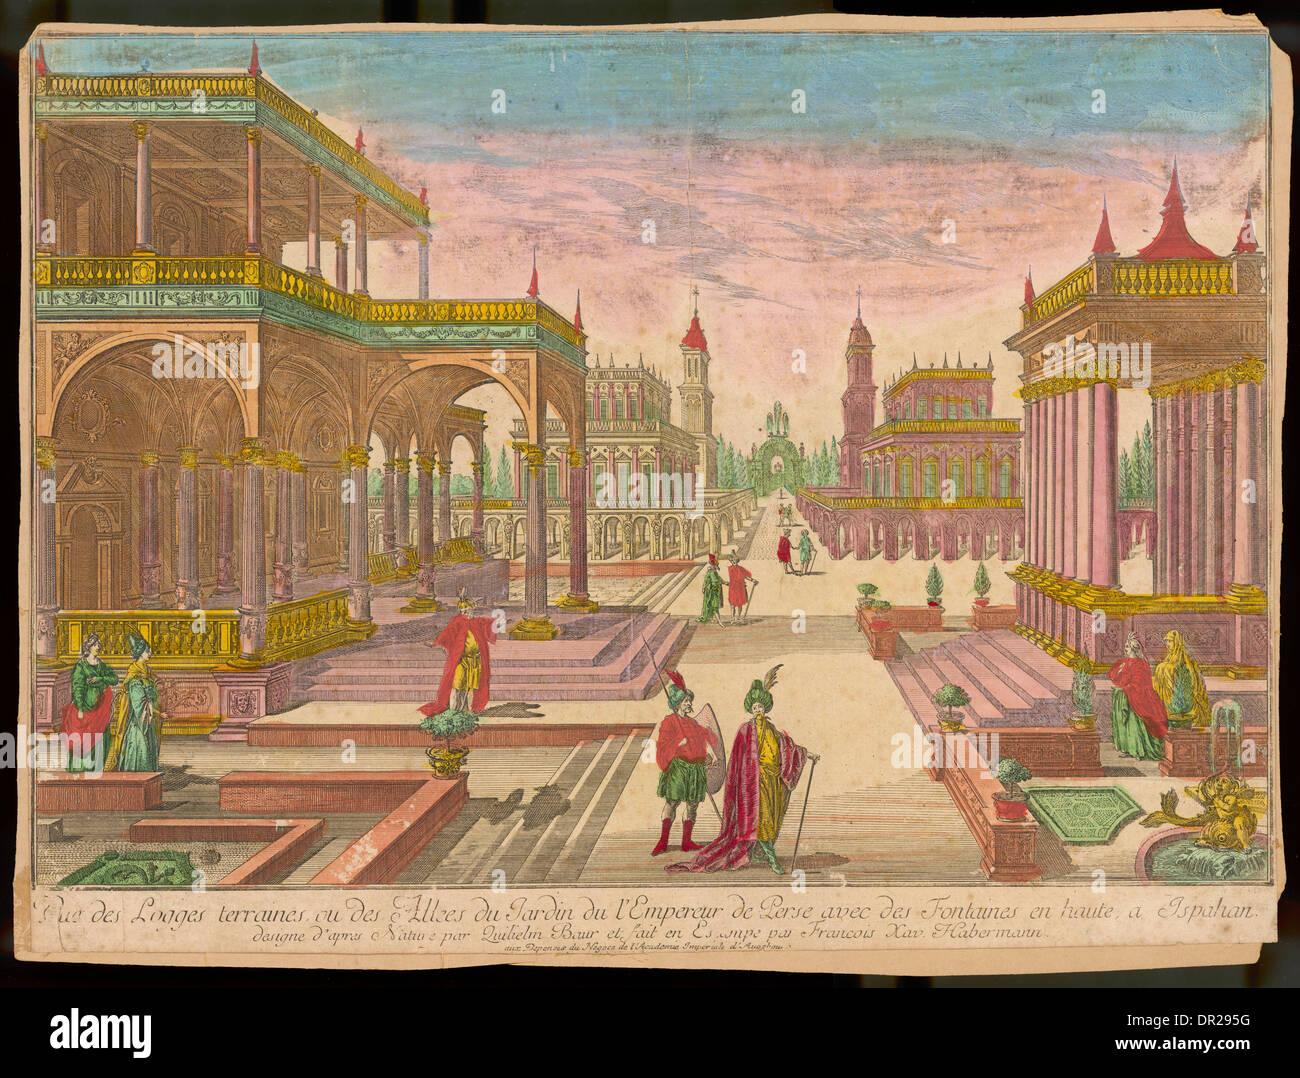 ESFAHAN, 18TH CENTURY - Stock Image